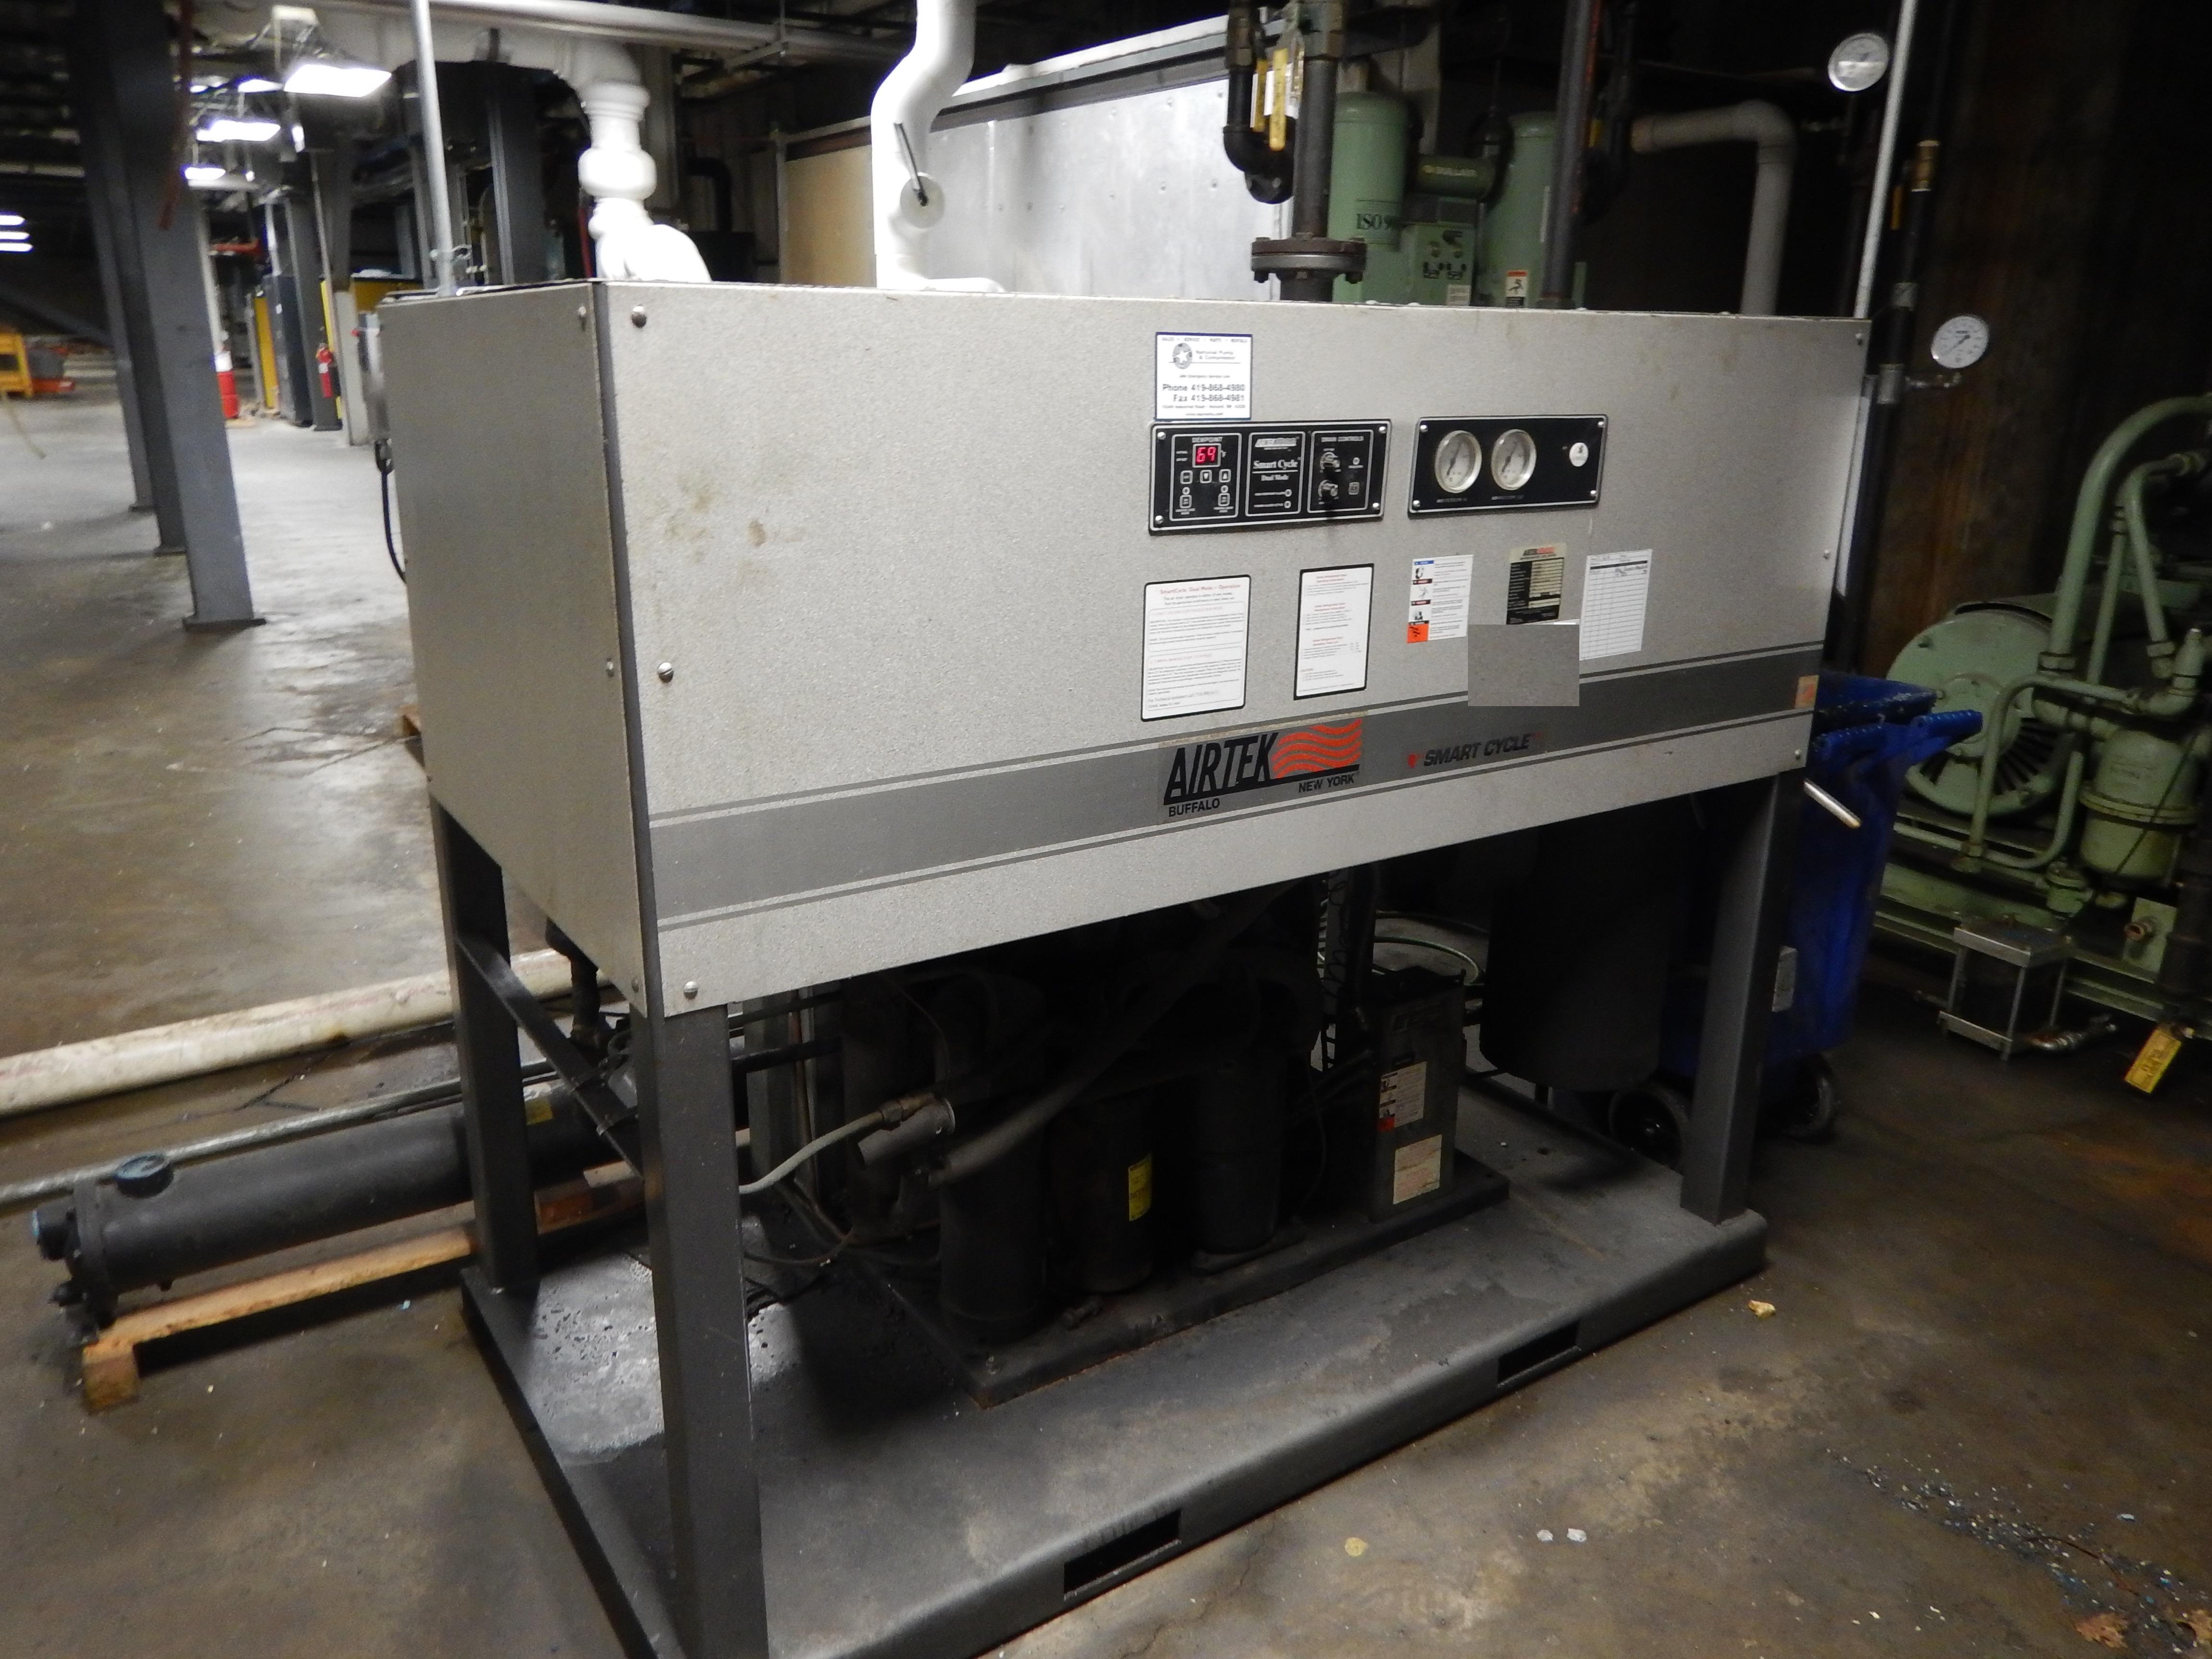 Airtek SC 800 Refrigerated Air Dryer